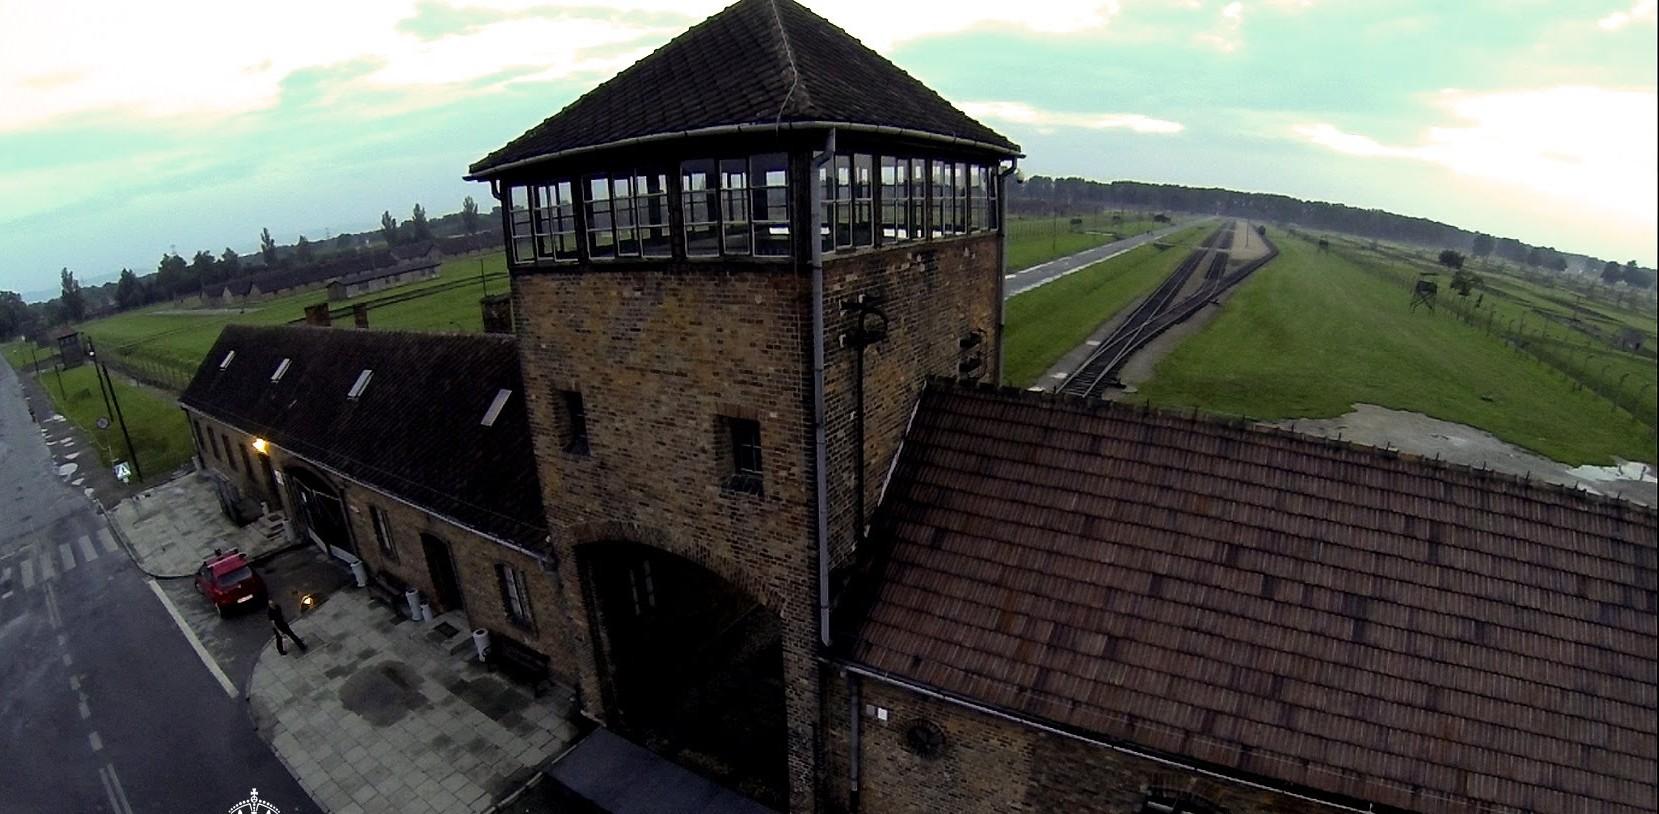 Auschwitz- Concentration camp